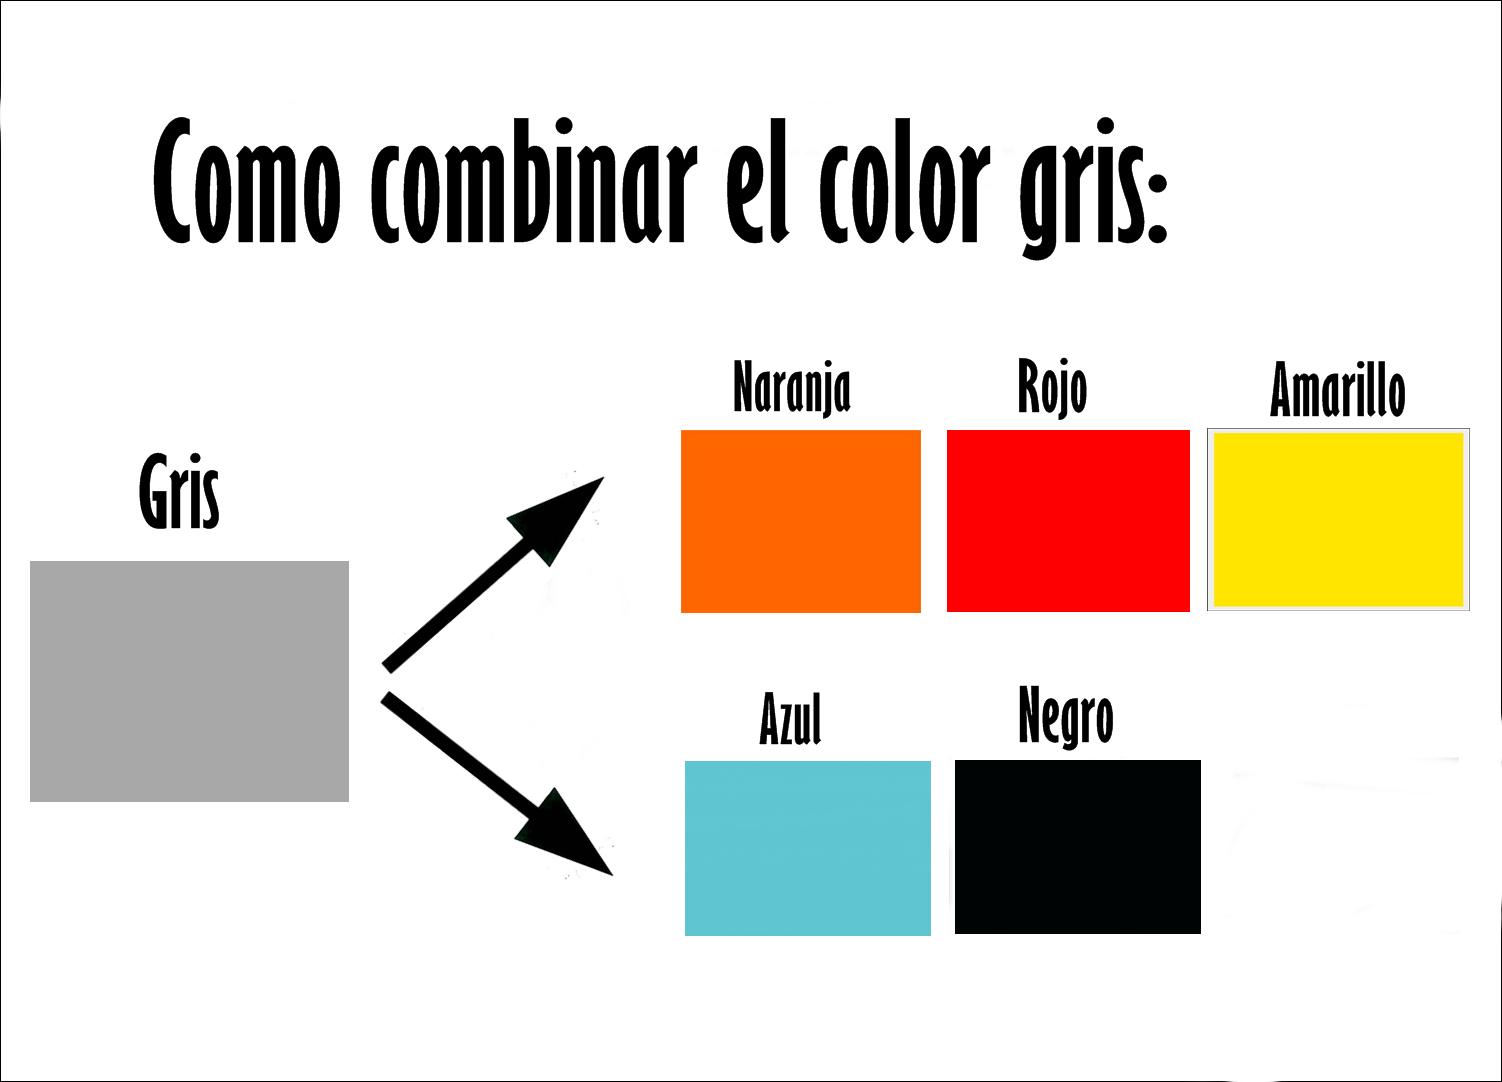 Combinar colores gris purificaci n ramos for Colores que combinan con gris claro